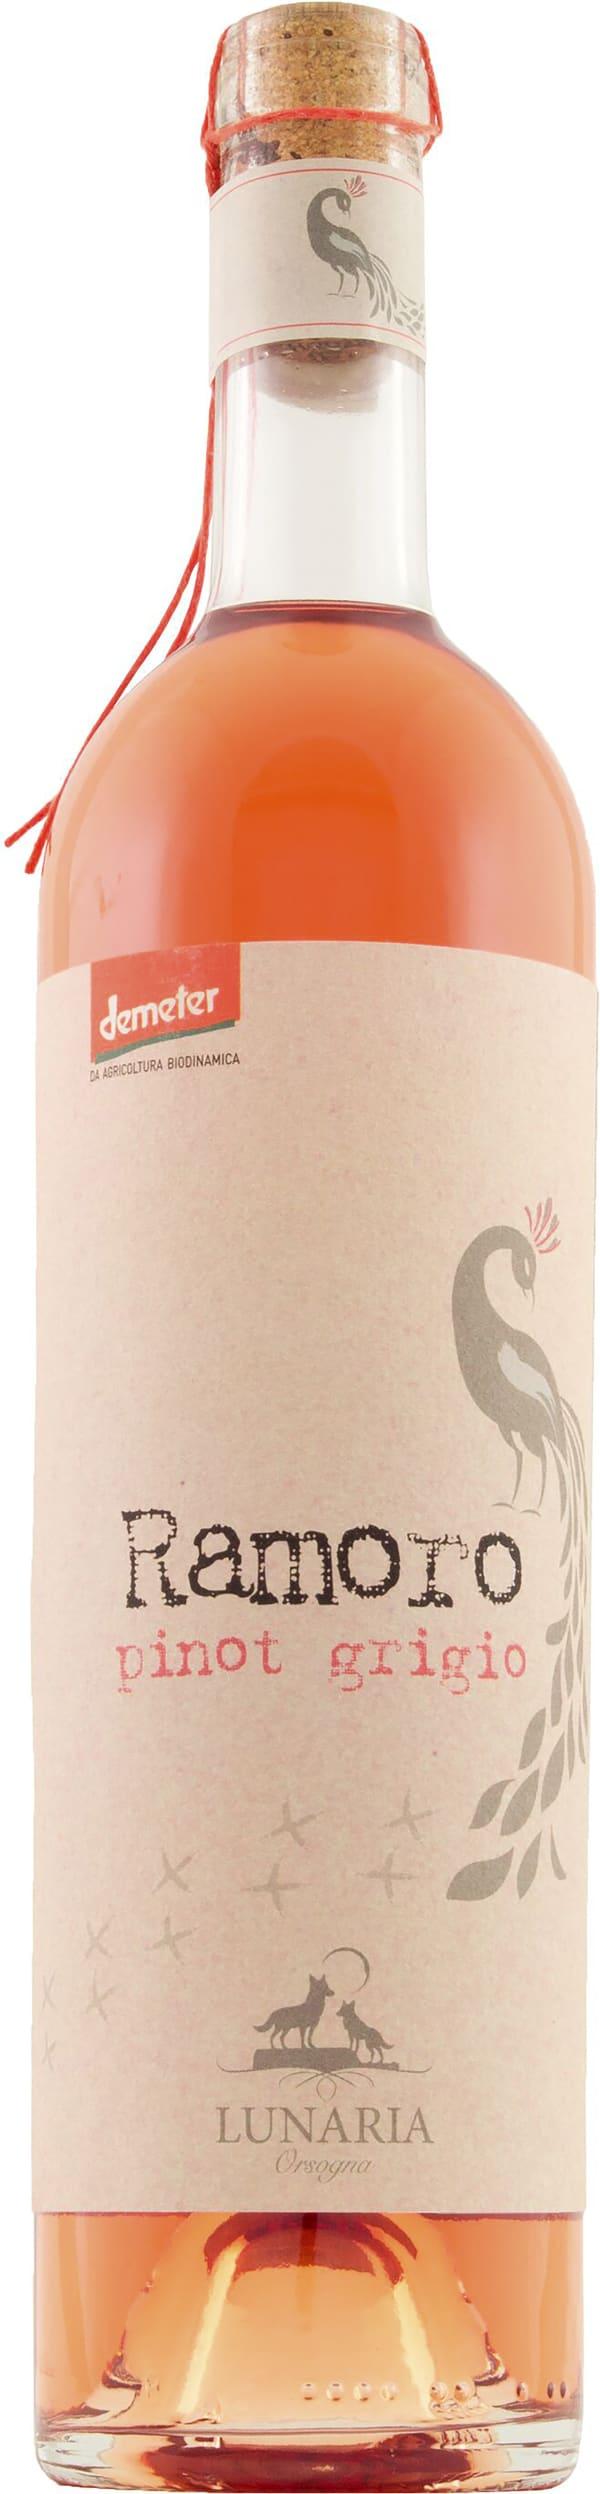 Orsogna Lunaria Ramoro Pinot Grigio Rosé 2017